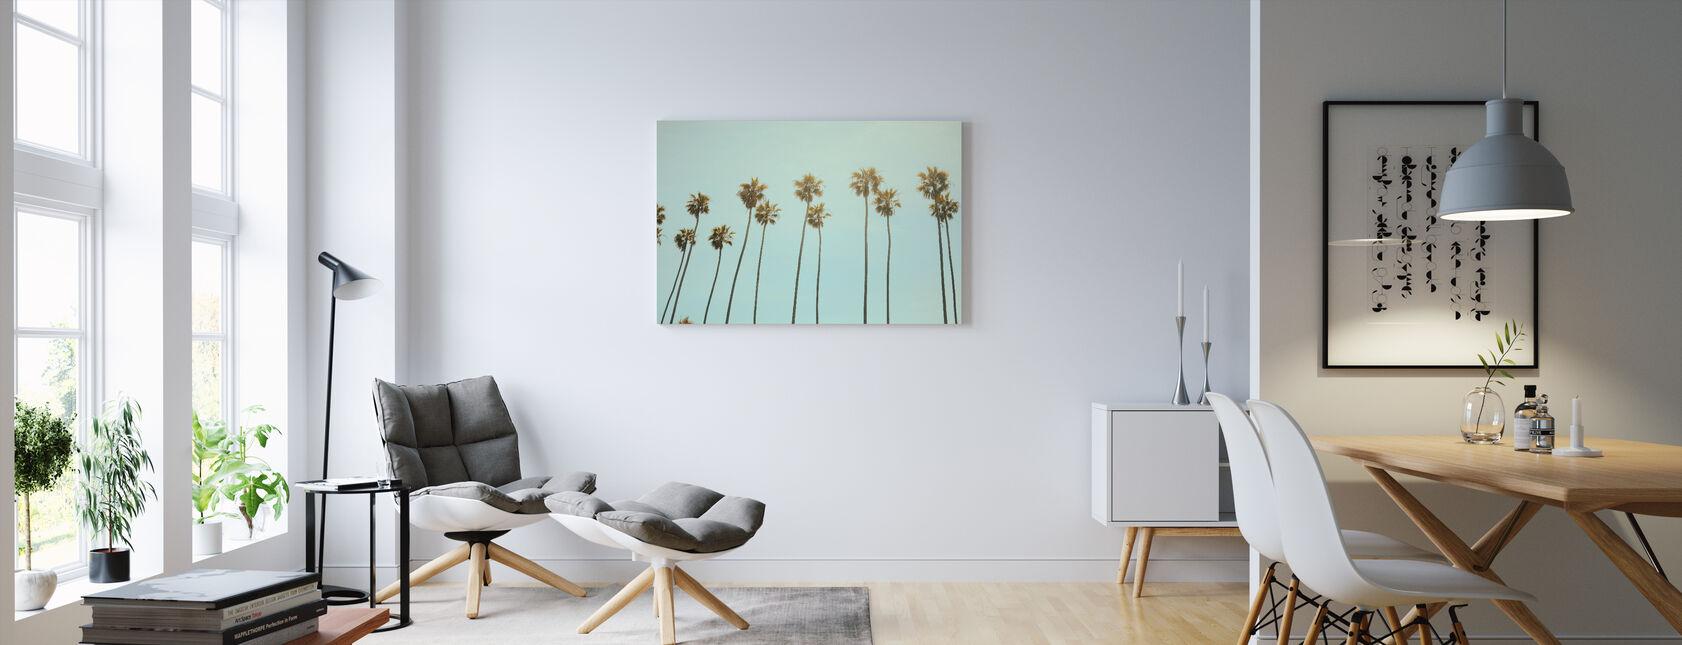 Santa Monica palmuja - Canvastaulu - Olohuone